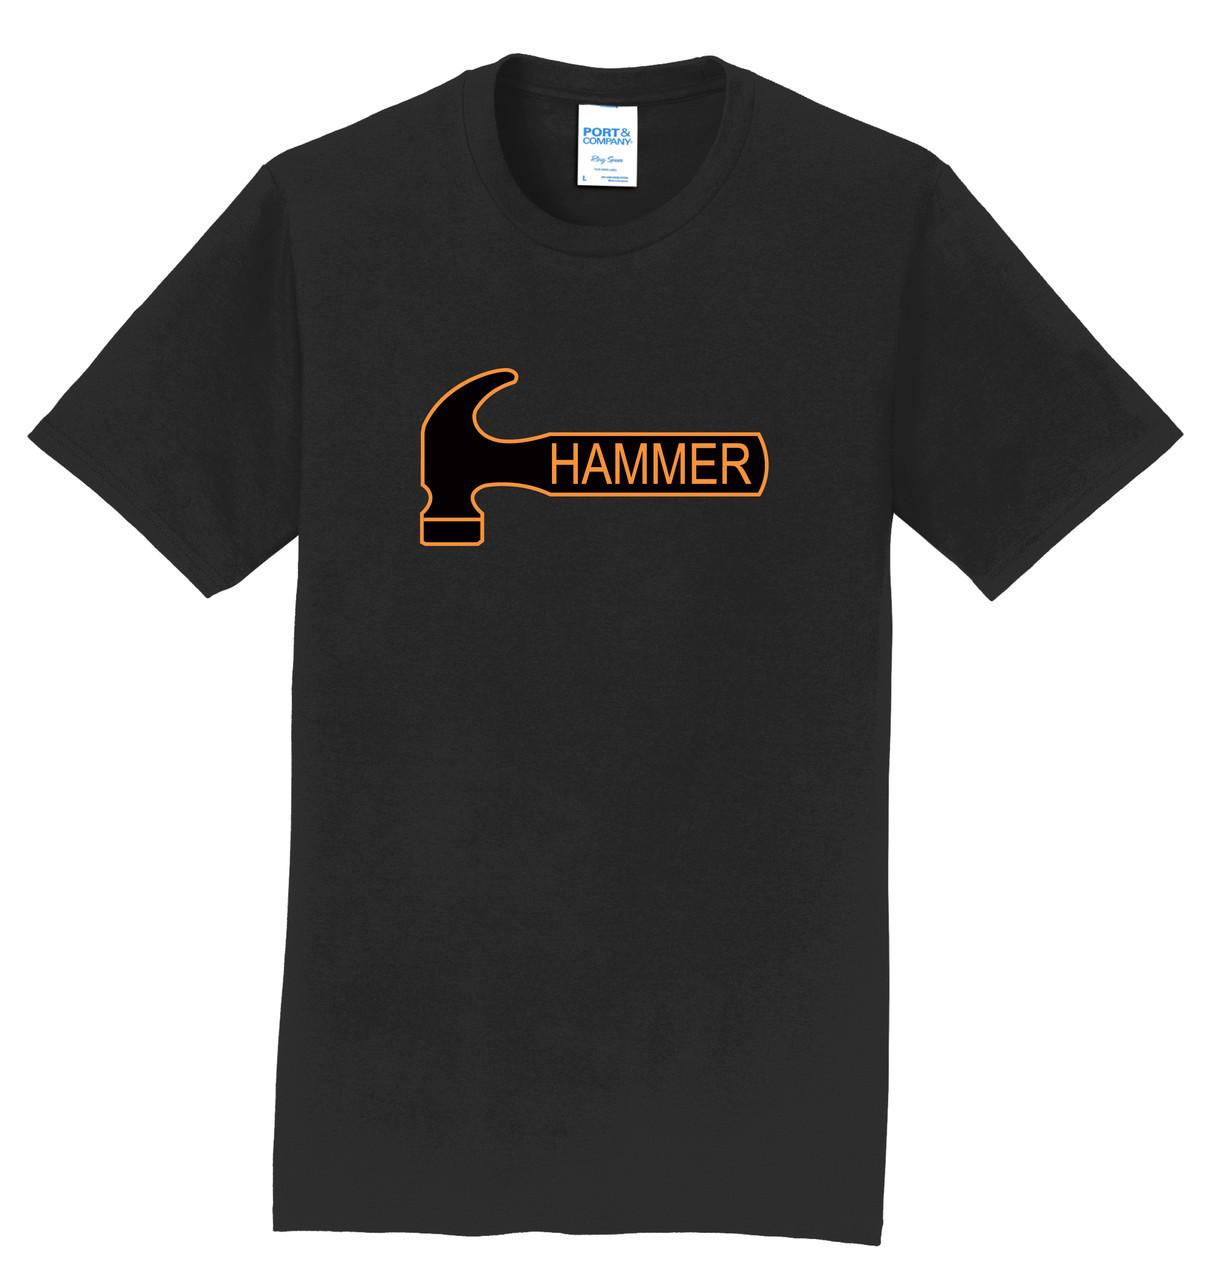 Hammer T-Shirt - Orange Black Logo - 6 Colors - 00DC